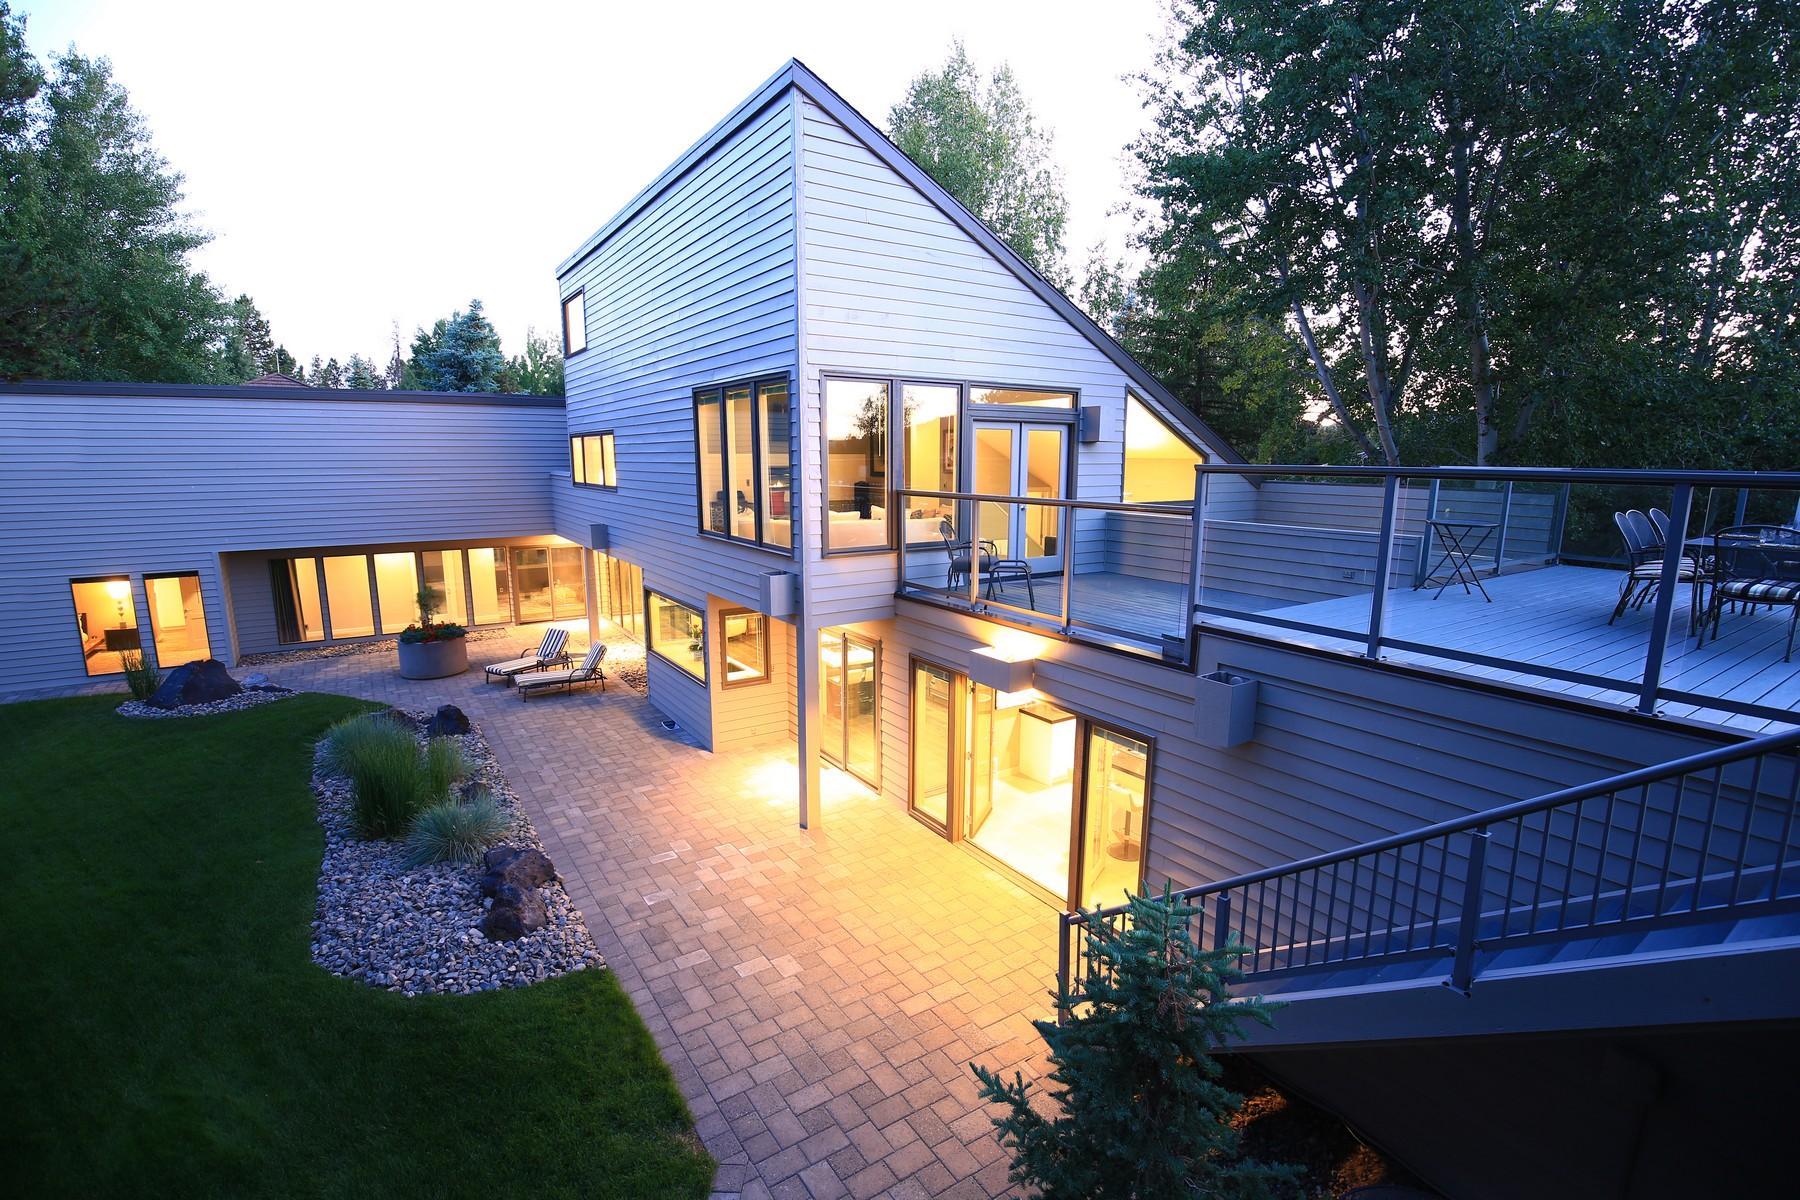 Other Residential Homes για την Πώληση στο 56930 Lone Eagle Landing 1 Sunriver, OR 97707 Sunriver, Ορεγκον 97707 Ηνωμένες Πολιτείες